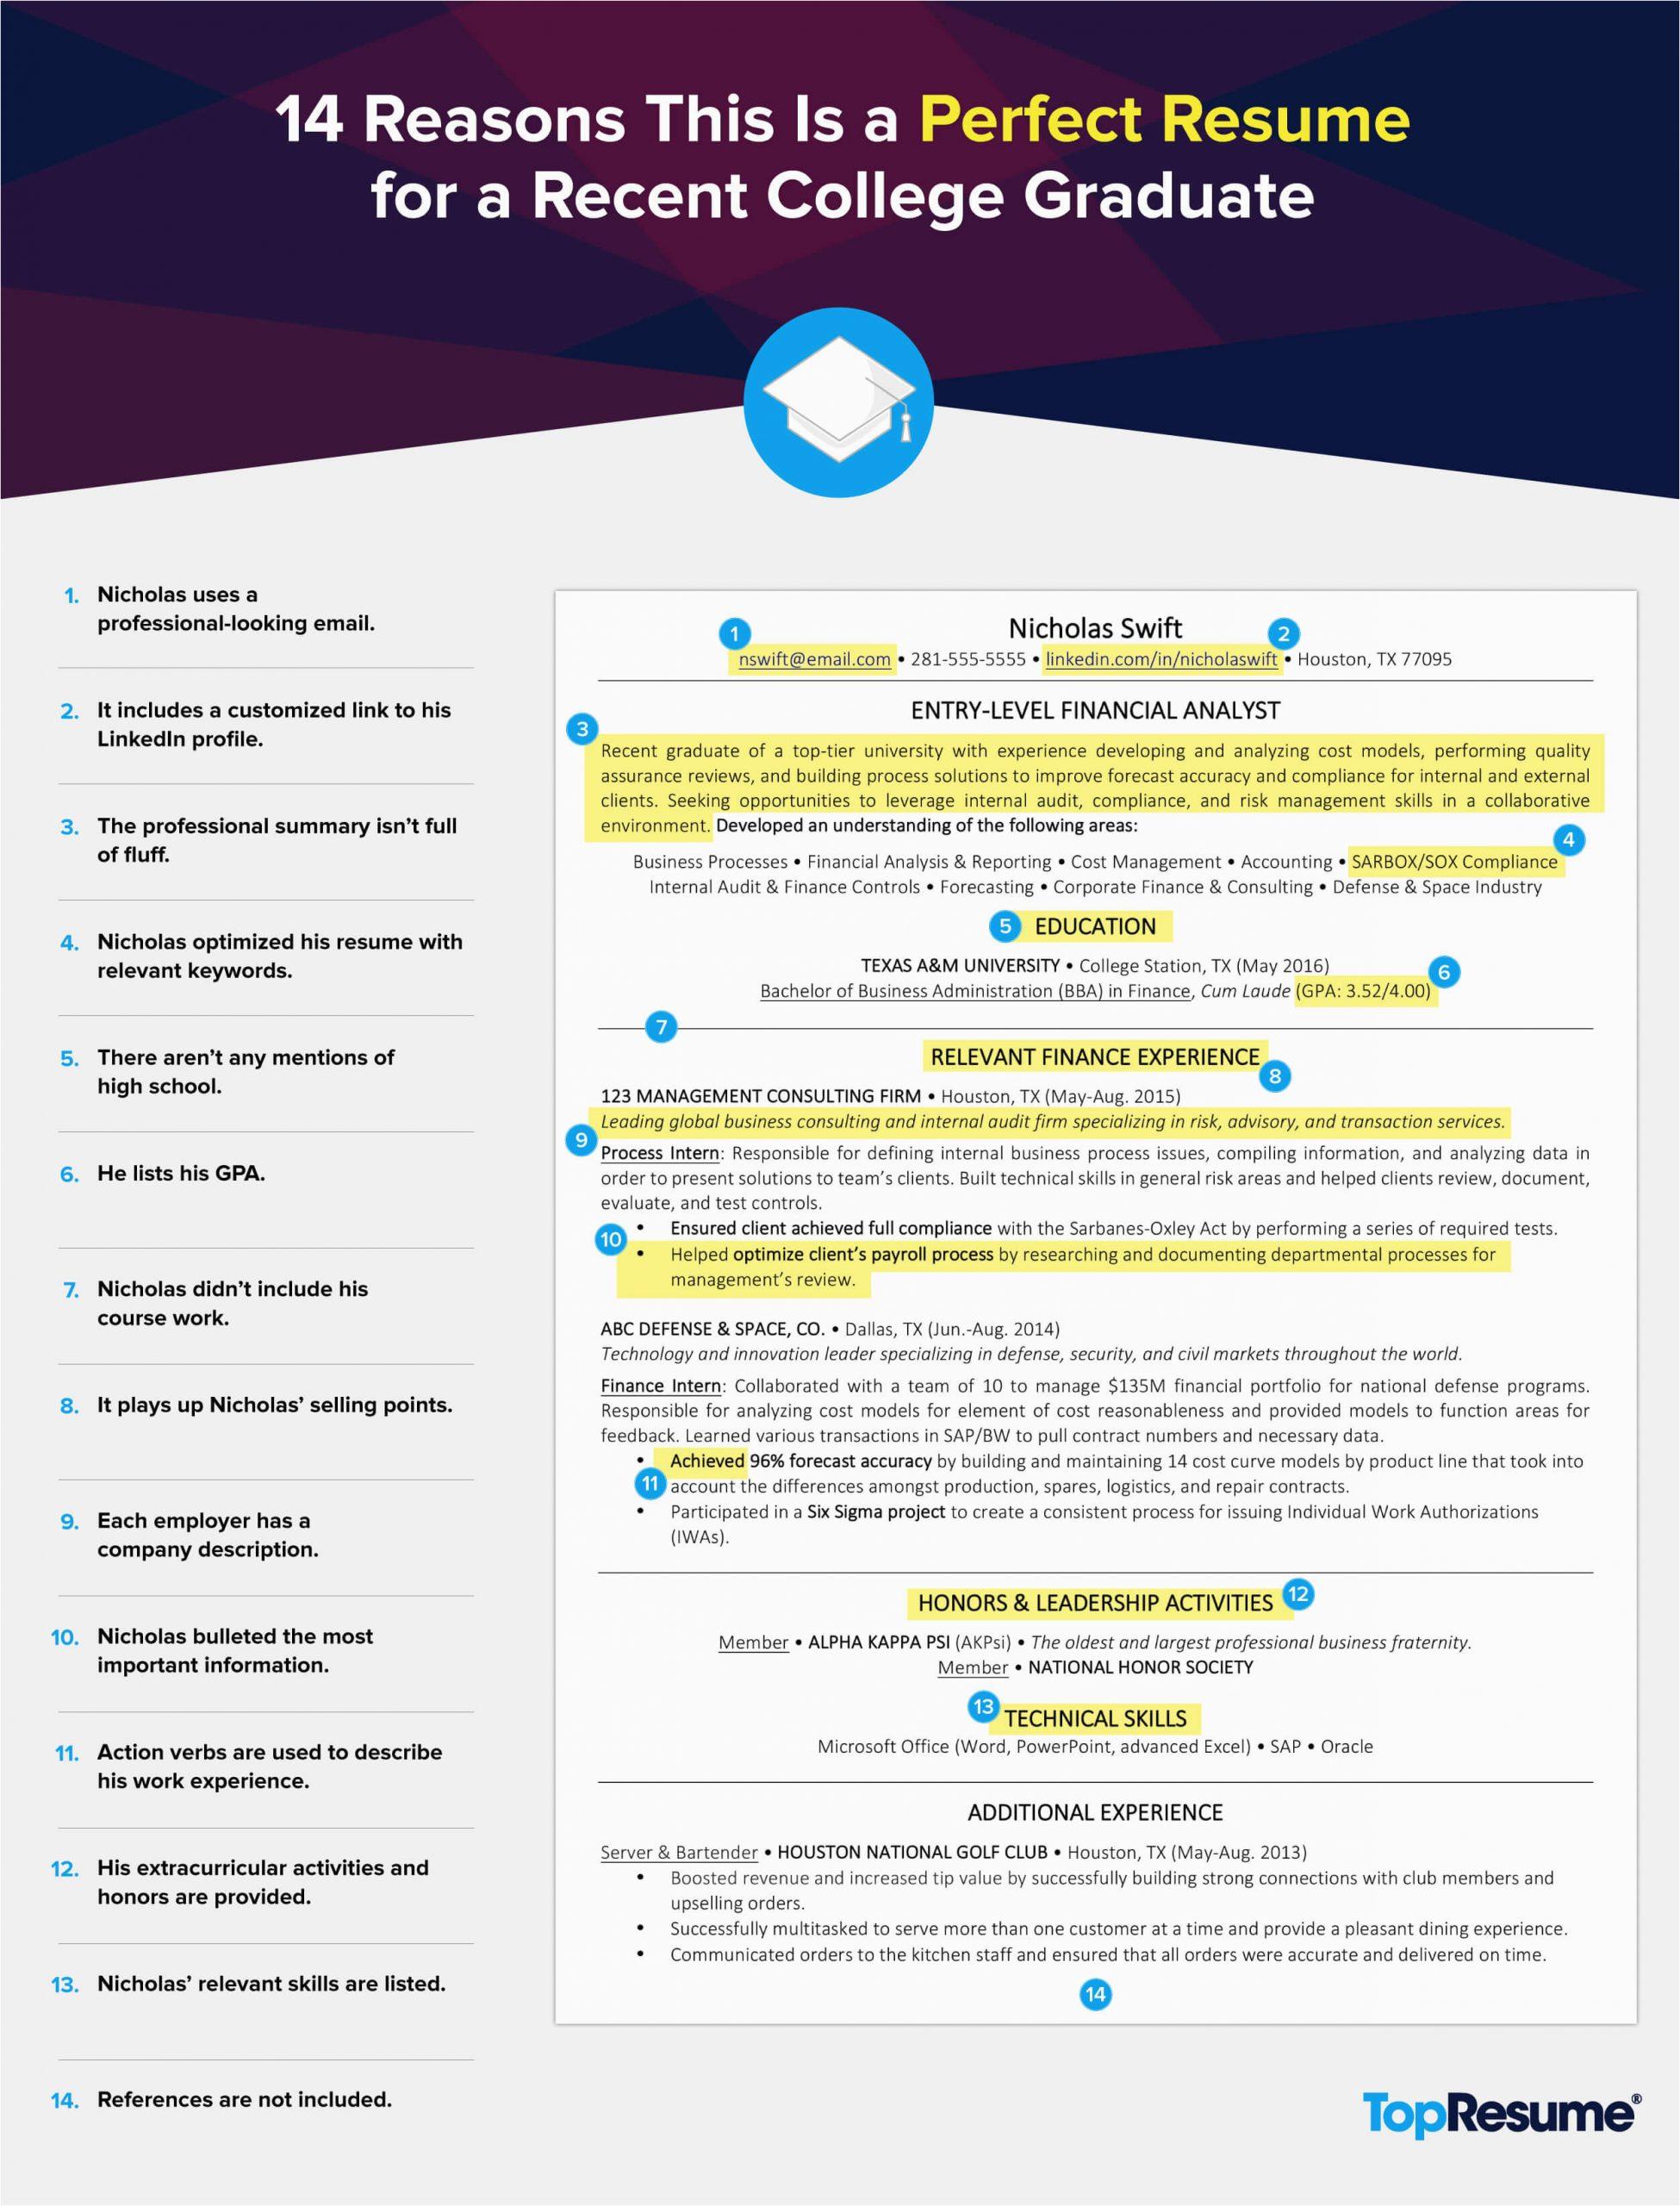 excellent resume for recent grad 05 2016